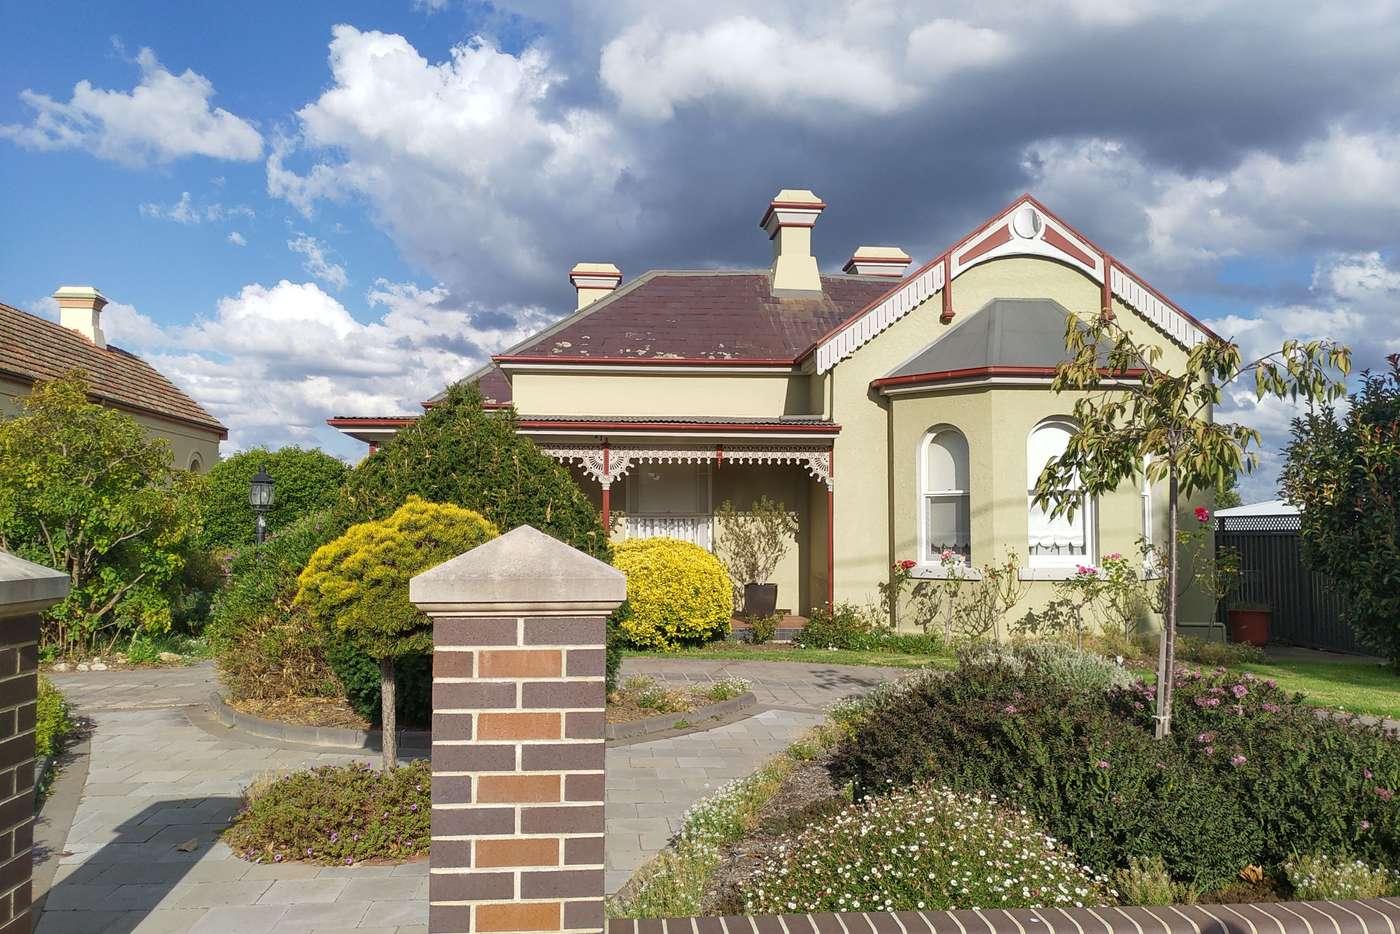 Main view of Homely house listing, 213 Faithfull Street, Goulburn NSW 2580